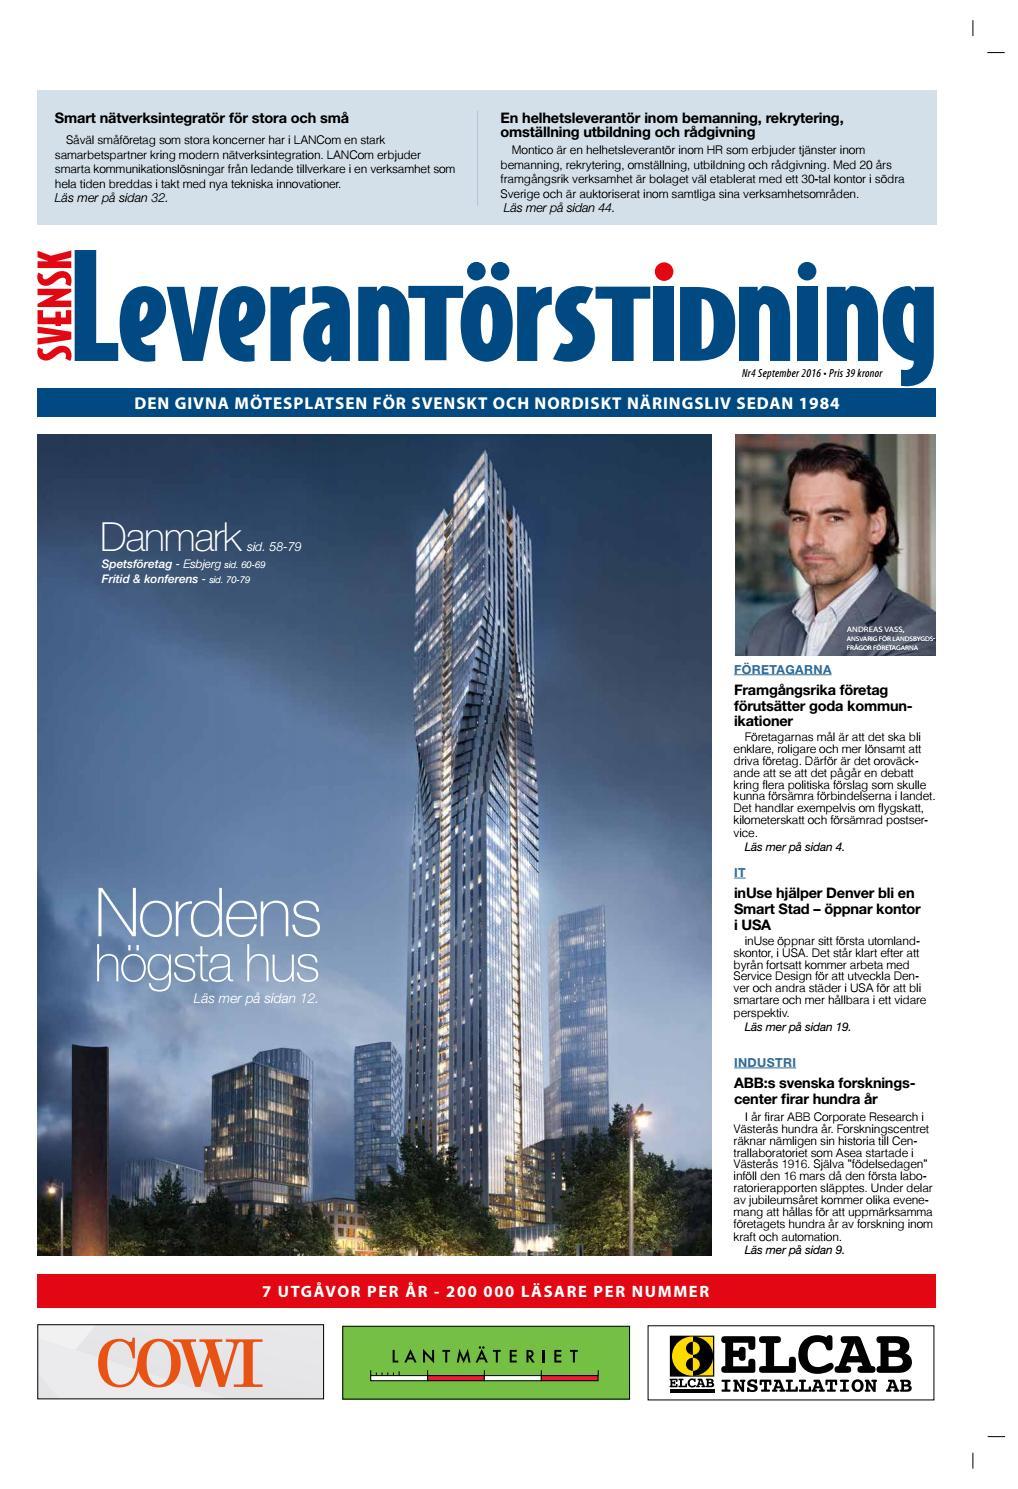 Svensk Leverantörstidning nr-4 2016 by Hexanova Media Group AB - issuu 35f44ab3e133d